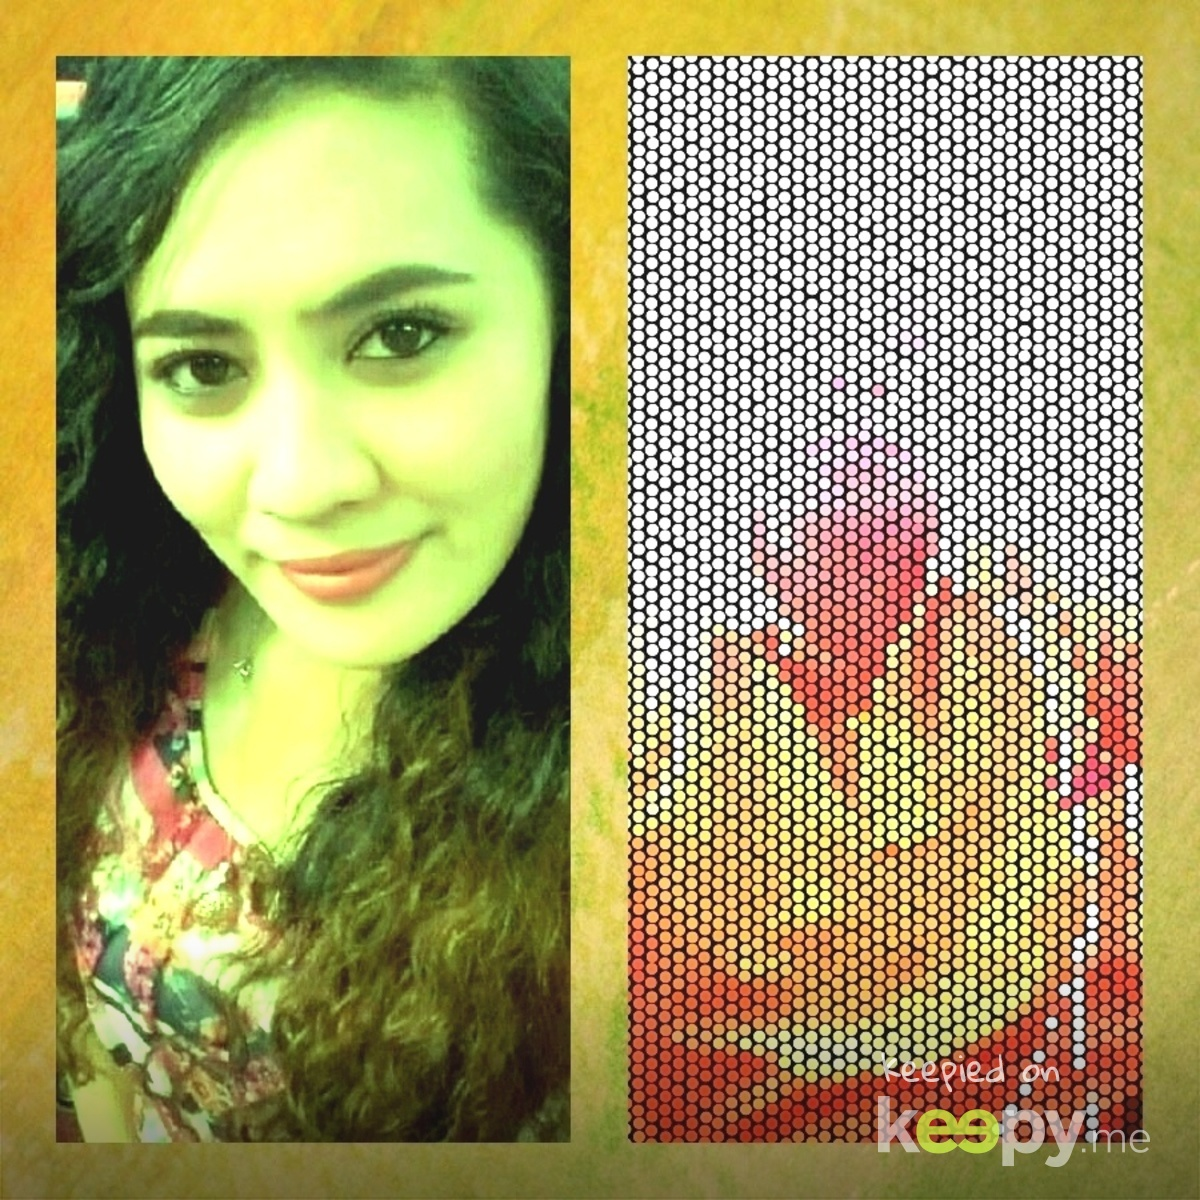 Keepy Card by lvavly Masud